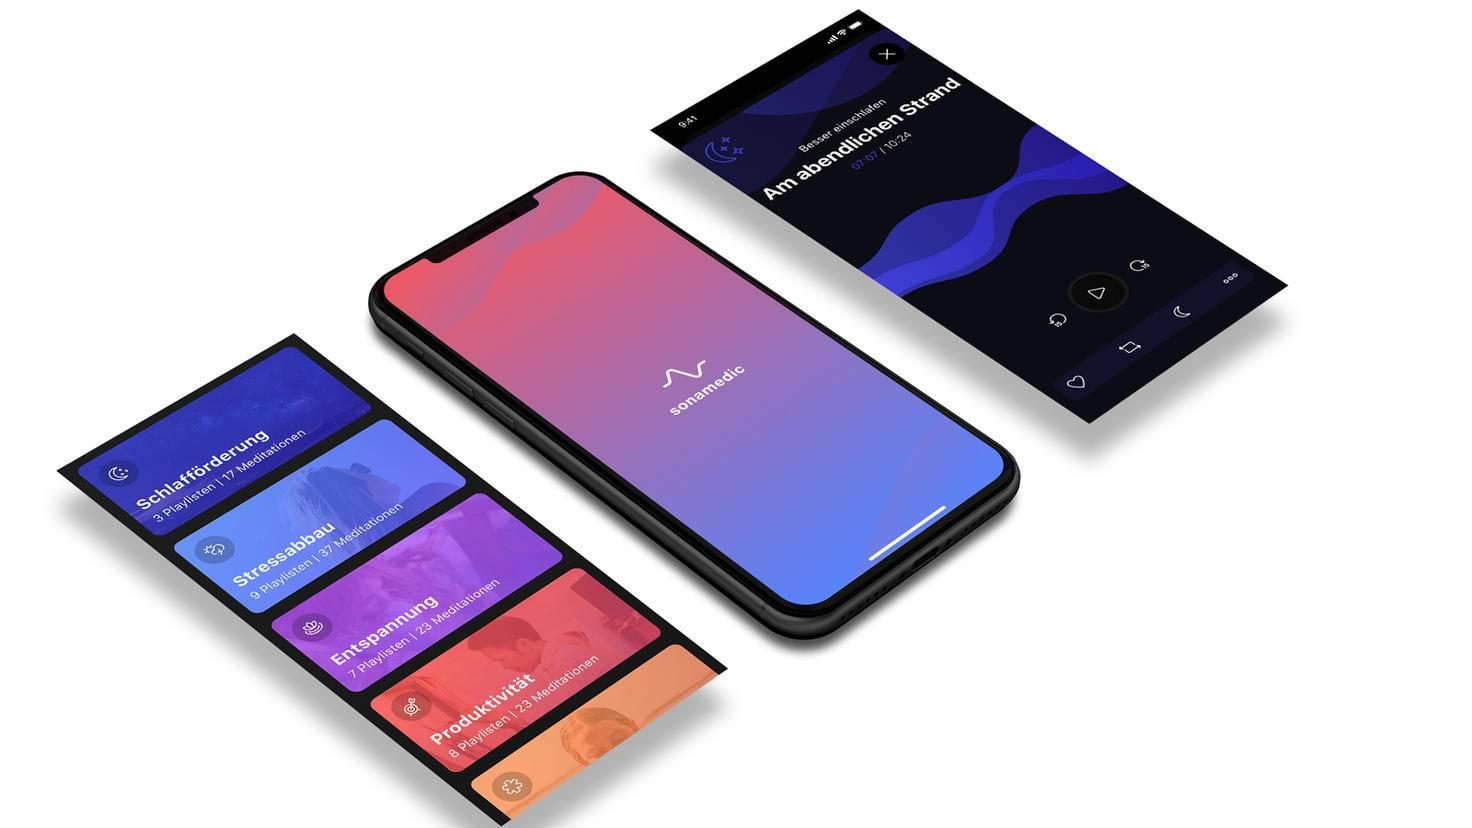 sonamedic app